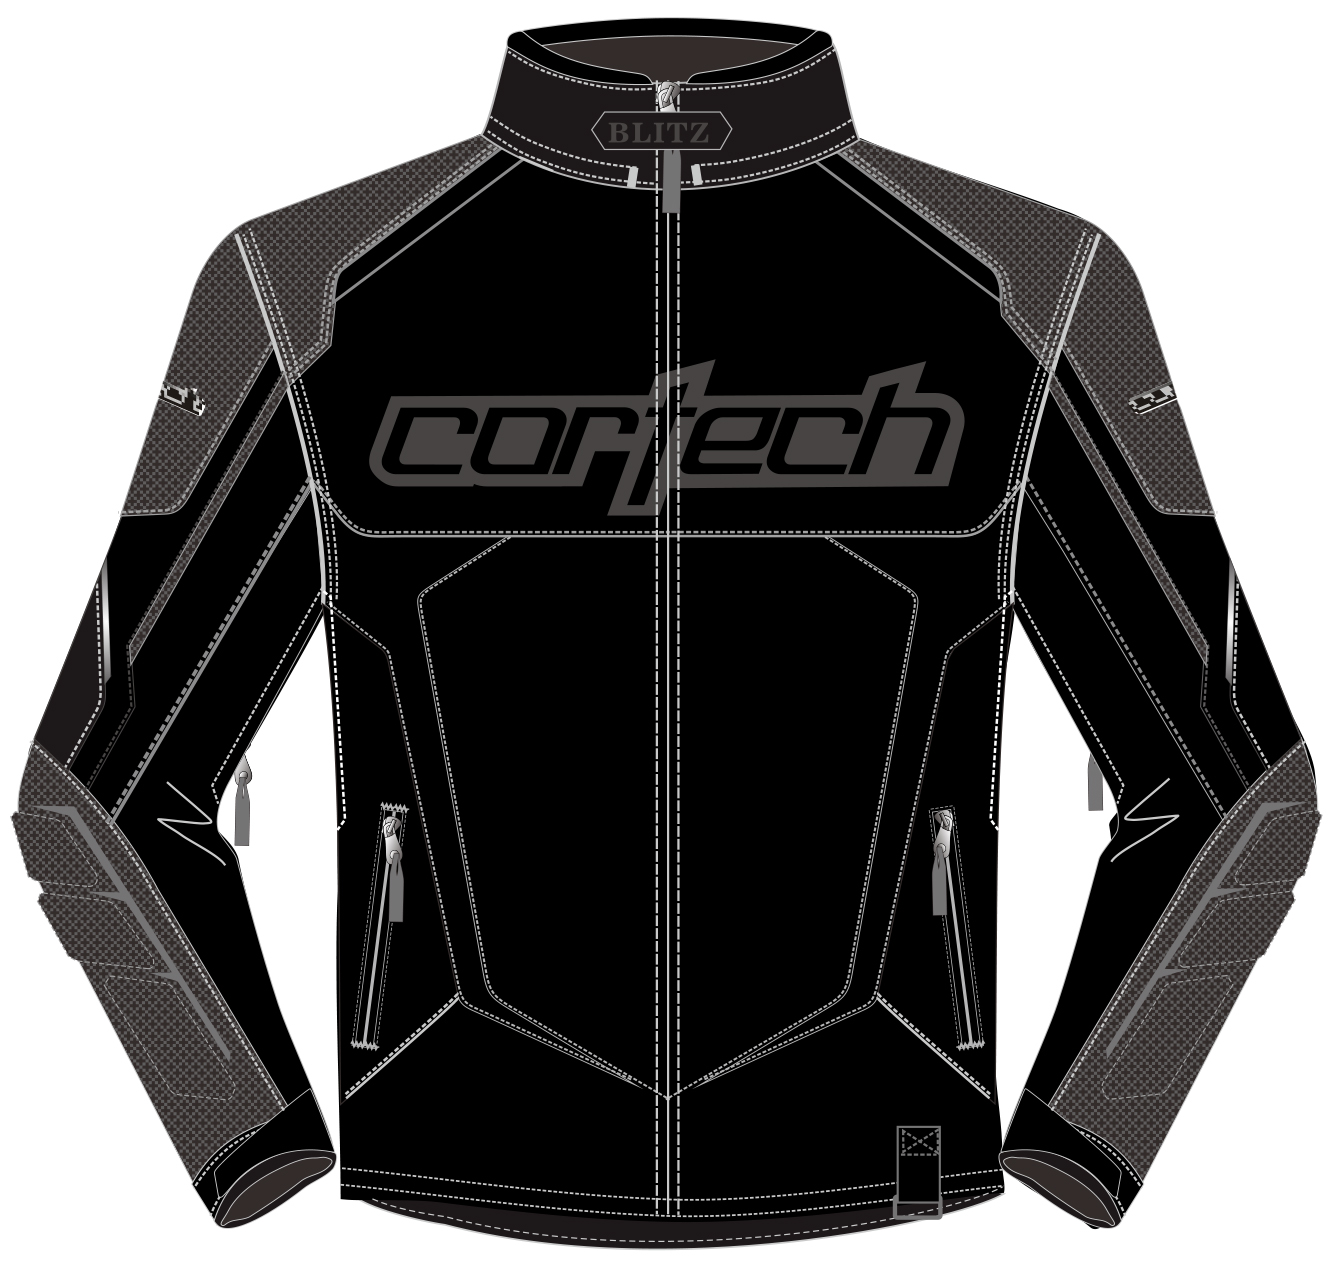 Cortech Blitz 3.0 Snowcross Jacket Black/Gun Metal LRG  8927-0305-06